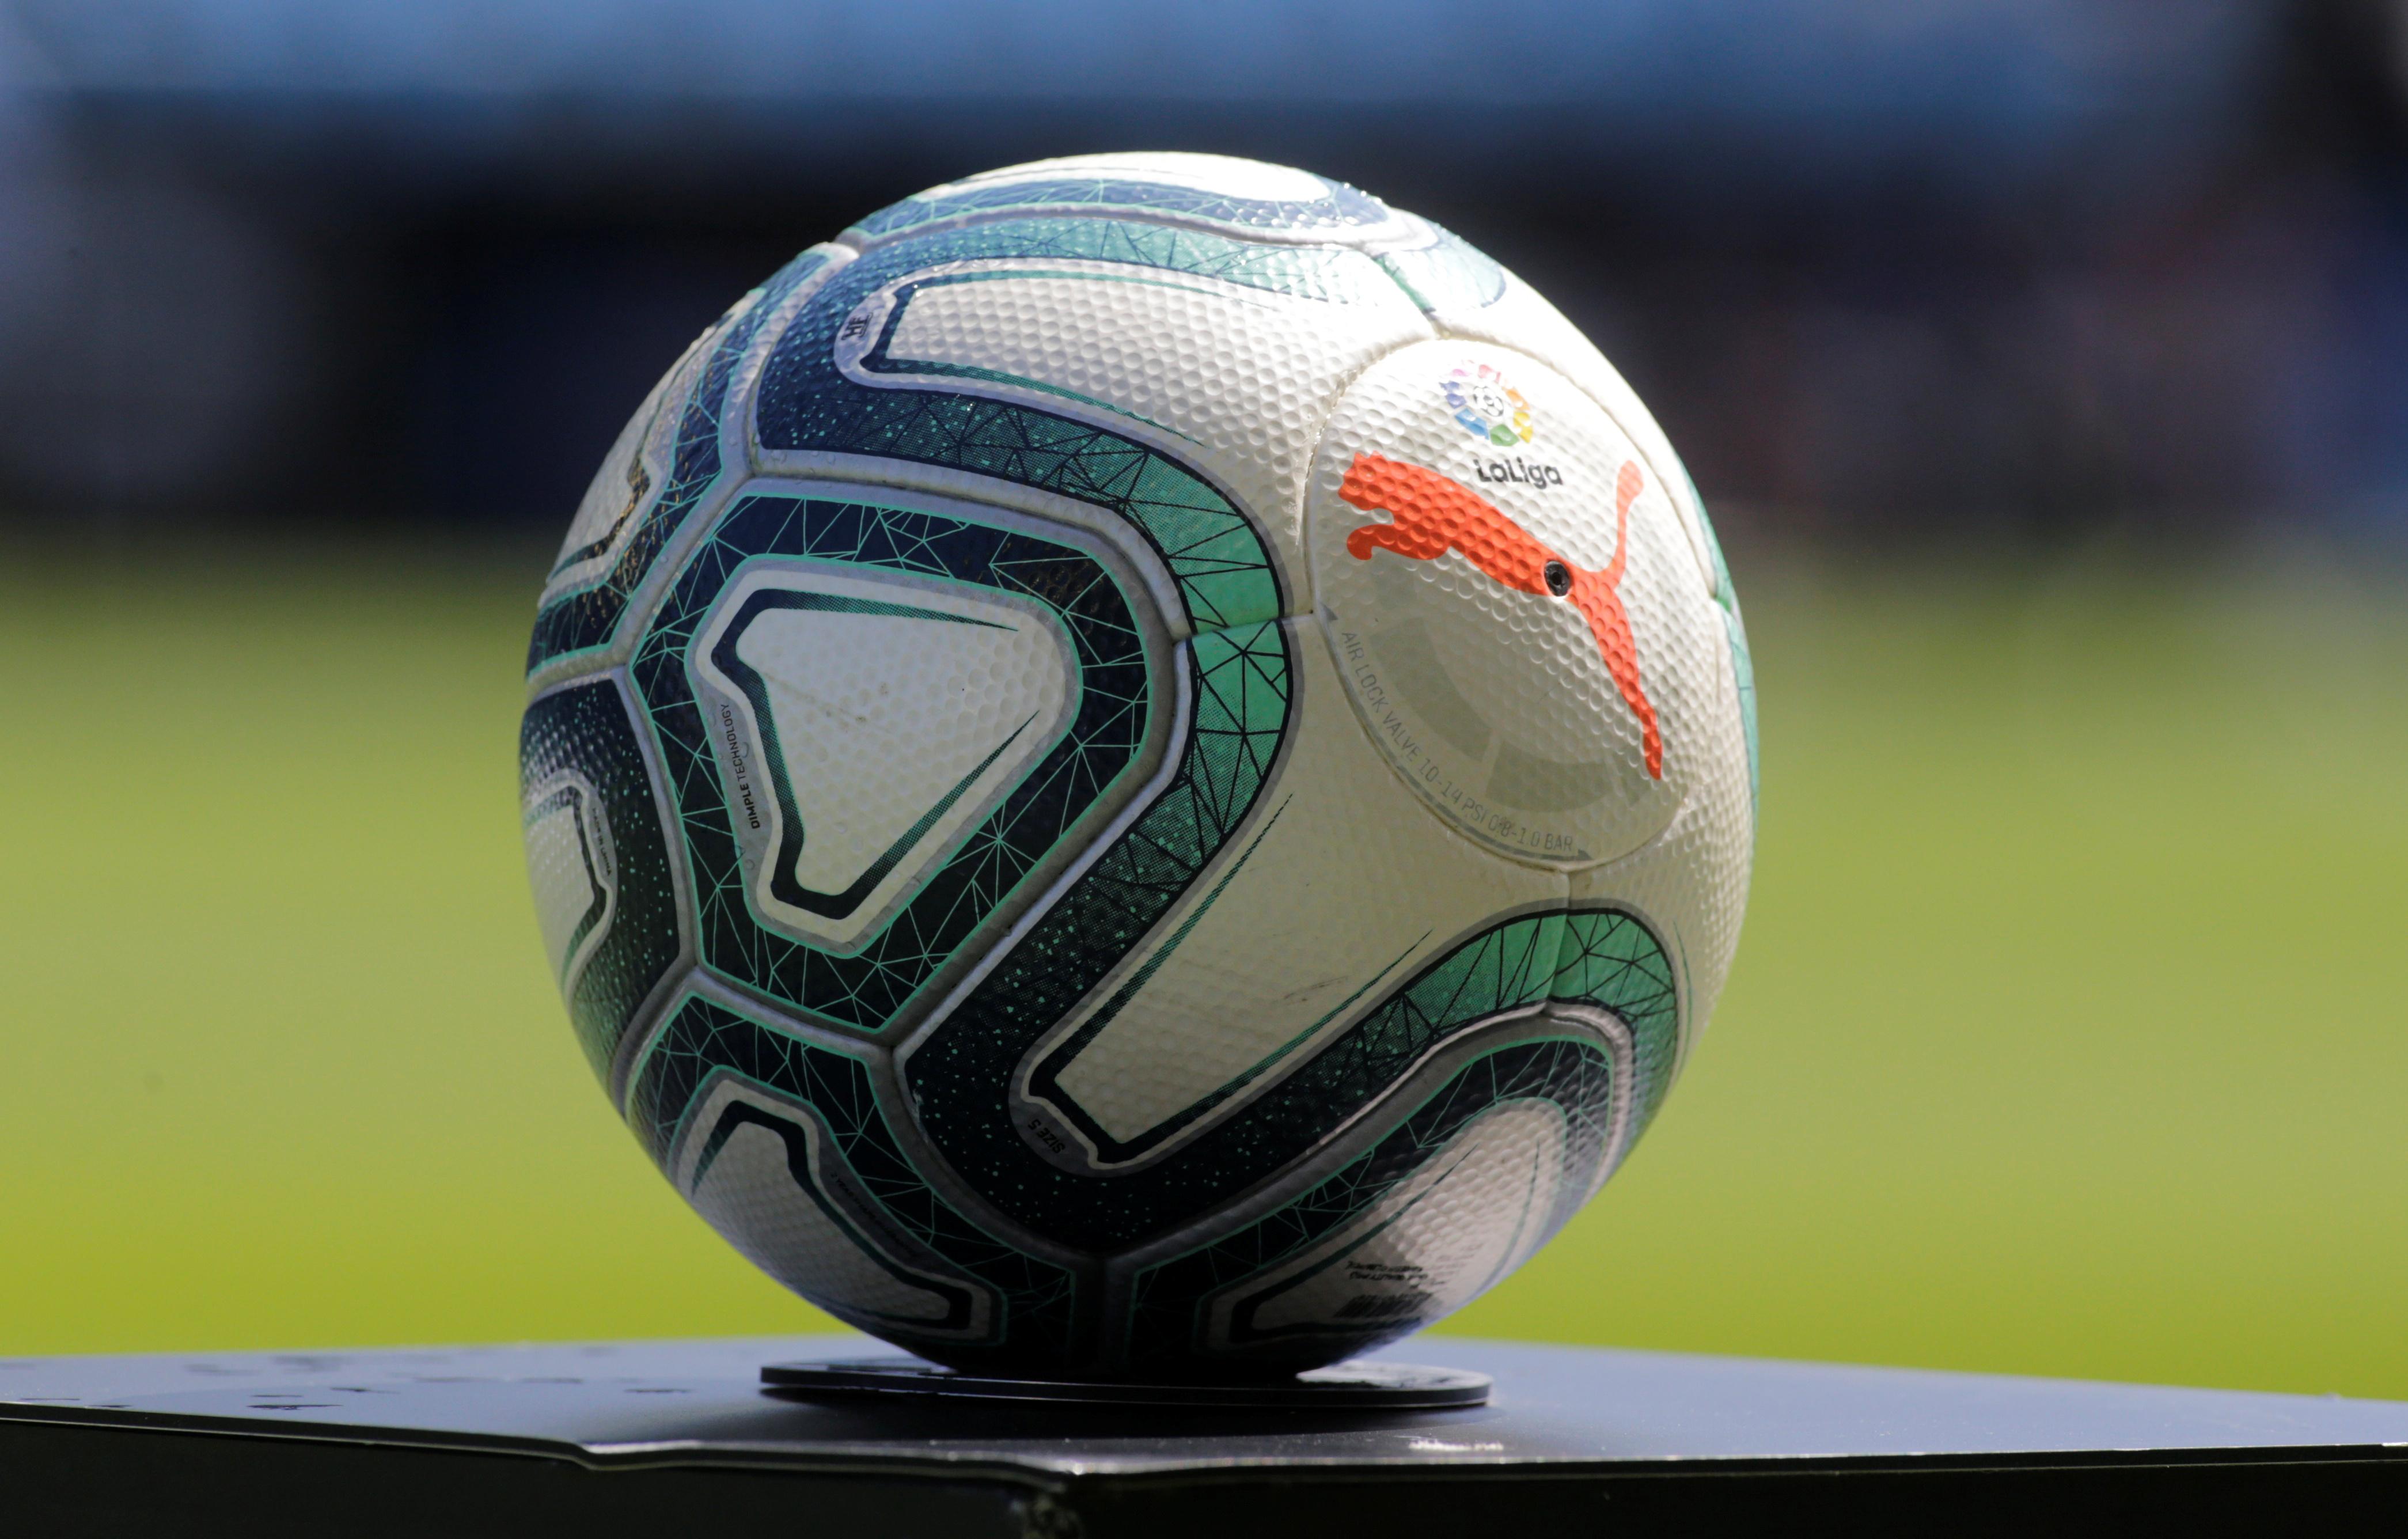 Soccer Football - La Liga Santander - Celta Vigo v Real Madrid - Balaidos, Vigo, Spain - August 17, 2019  General view of ball  REUTERS/Miguel Vidal